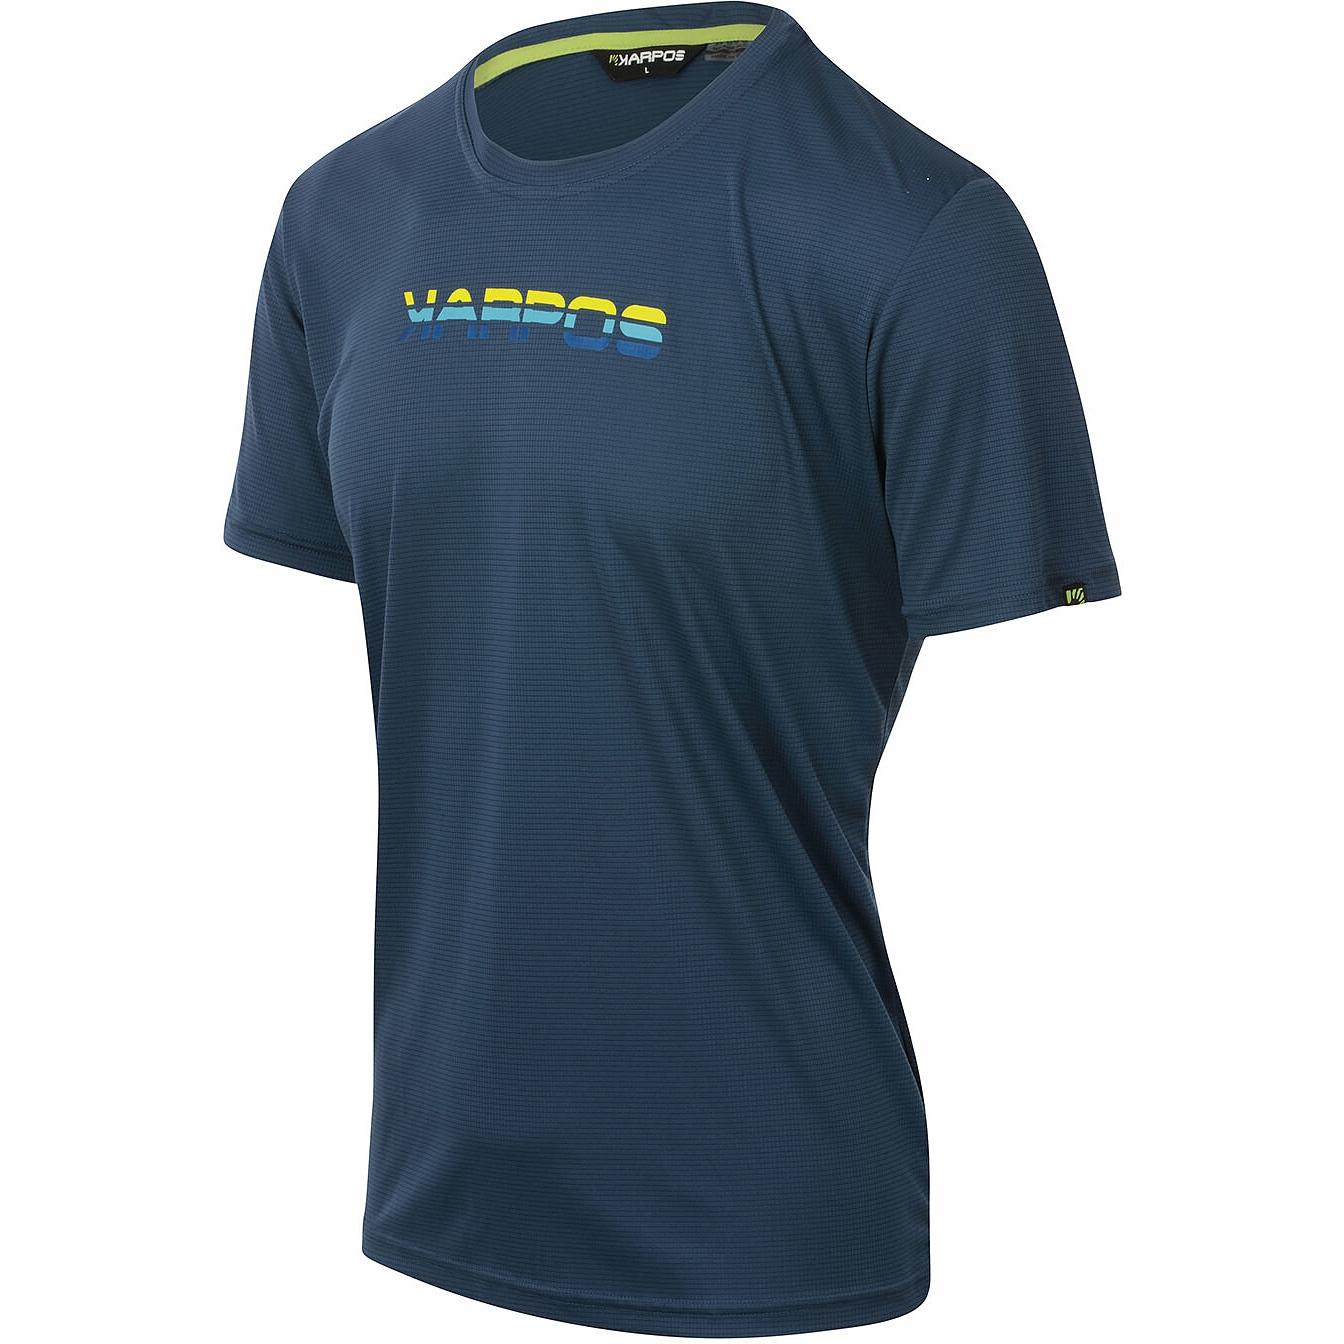 Karpos Loma T-Shirt - insignia blue